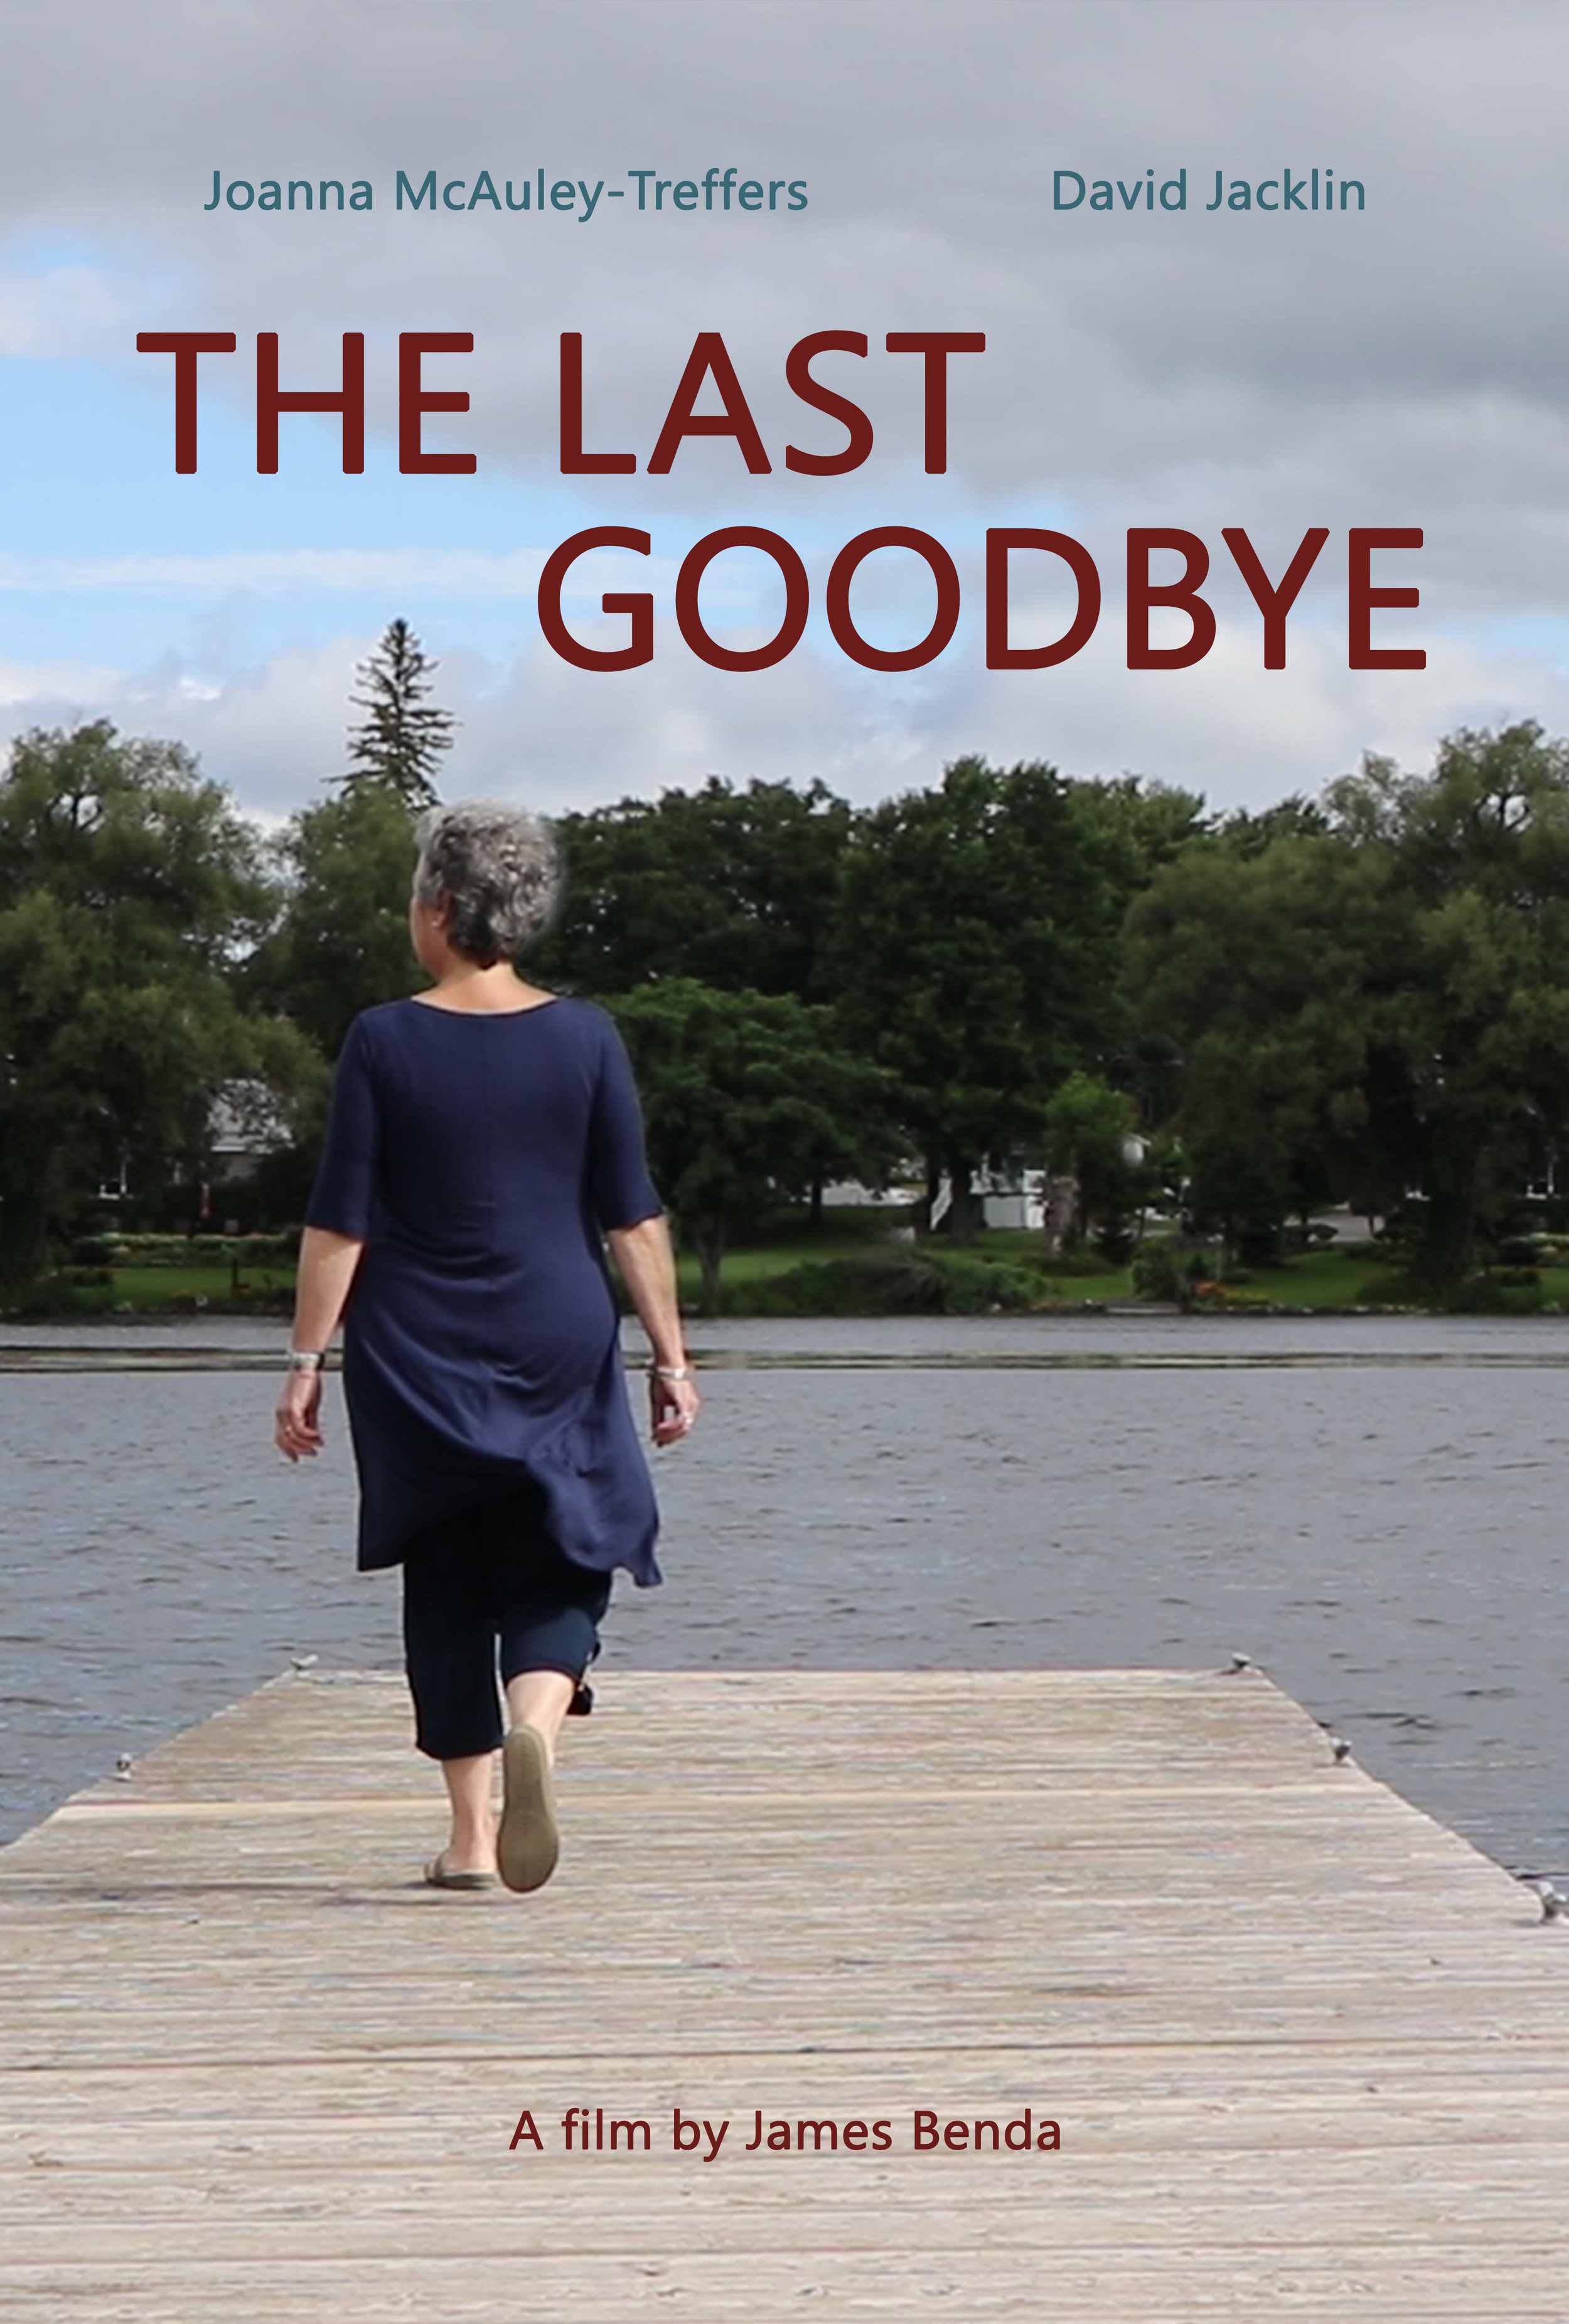 The Last Goodbye-Poster.jpg